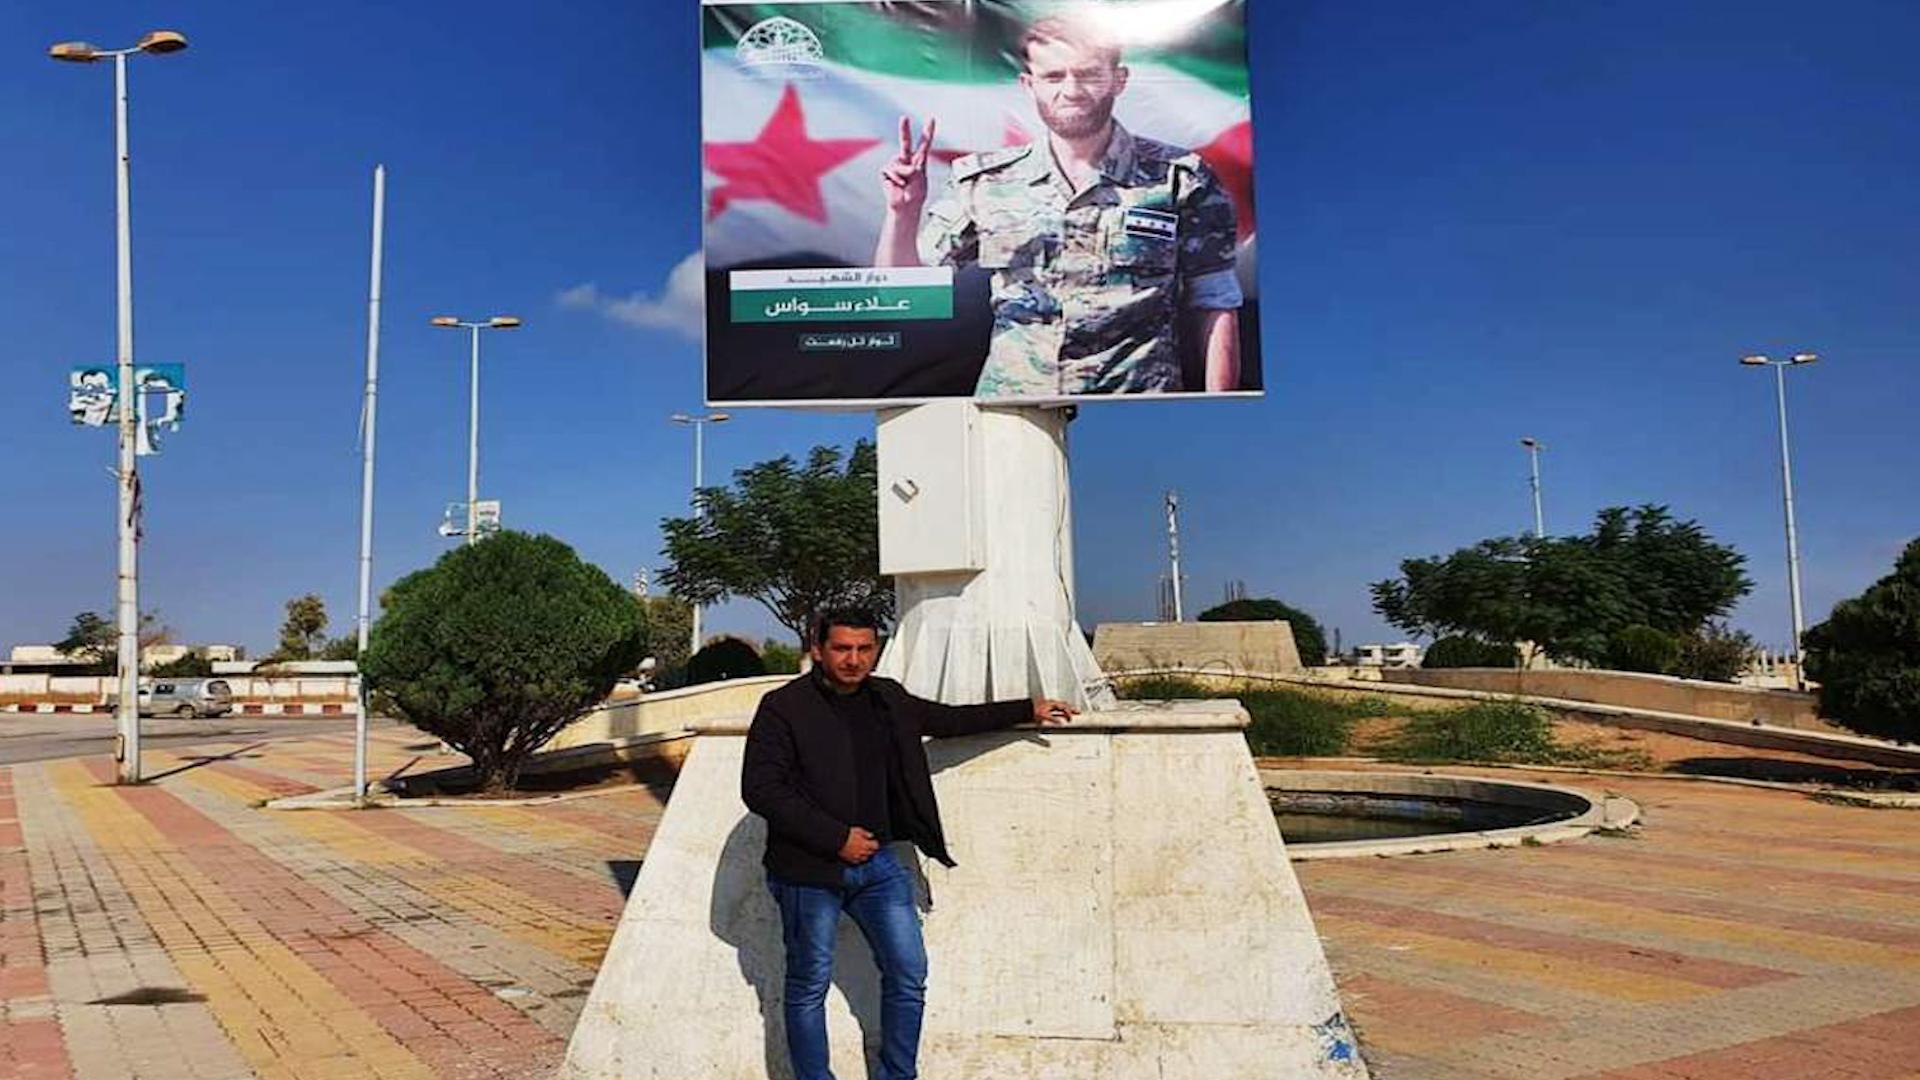 Photo of الاحتلال التركي يواصل تغيير معالم كري سبي/تل ابيض